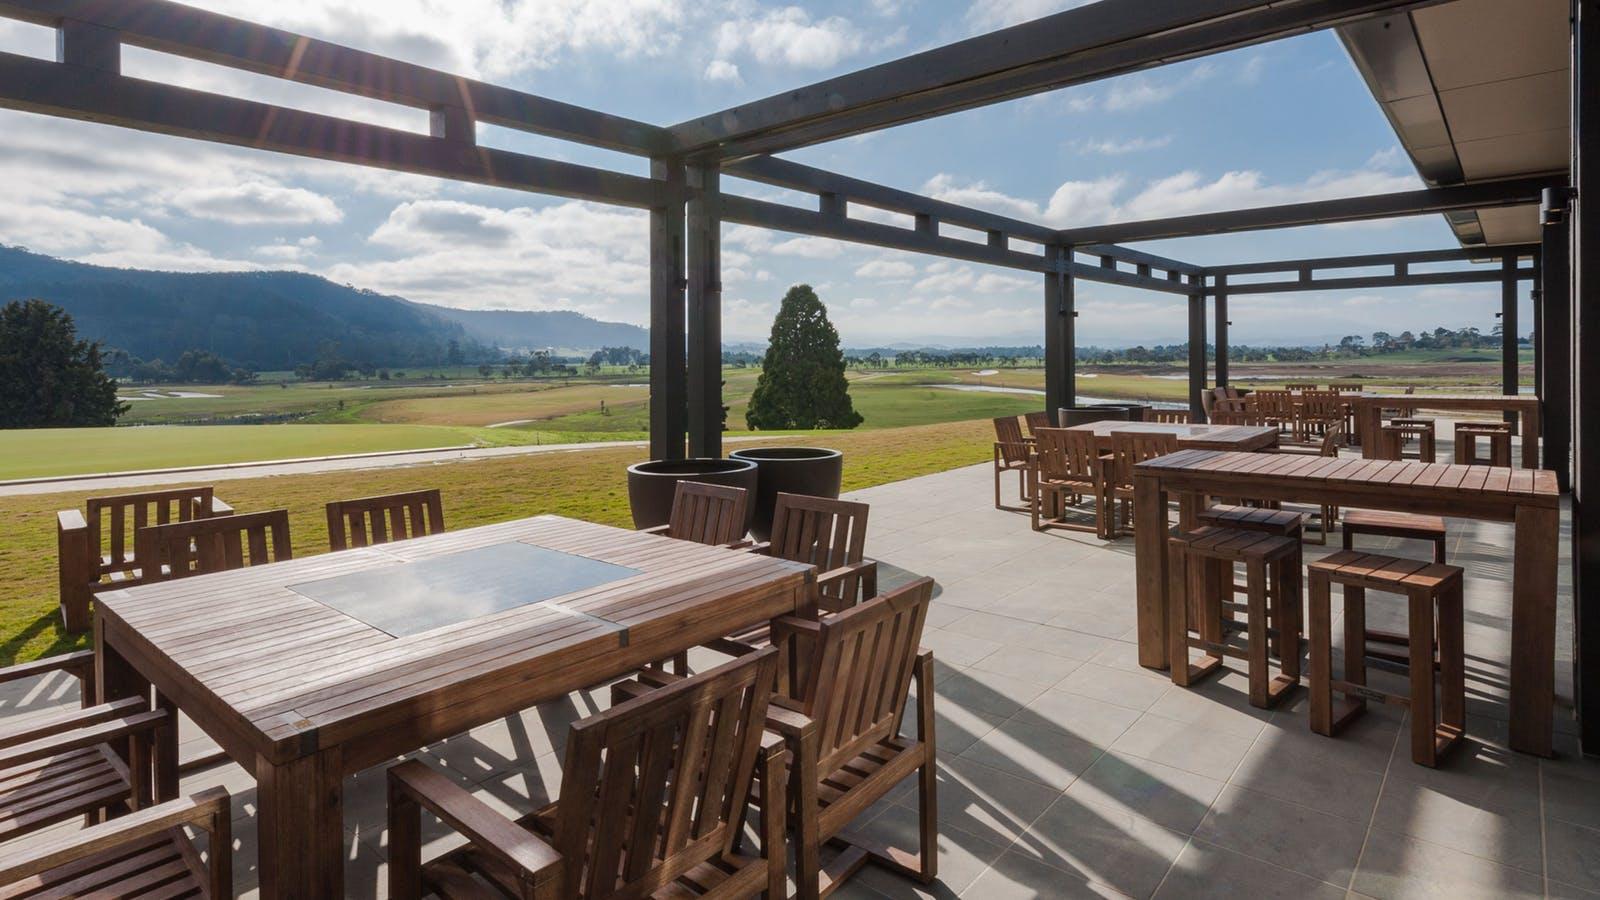 The Eastern Golf Club Terrace